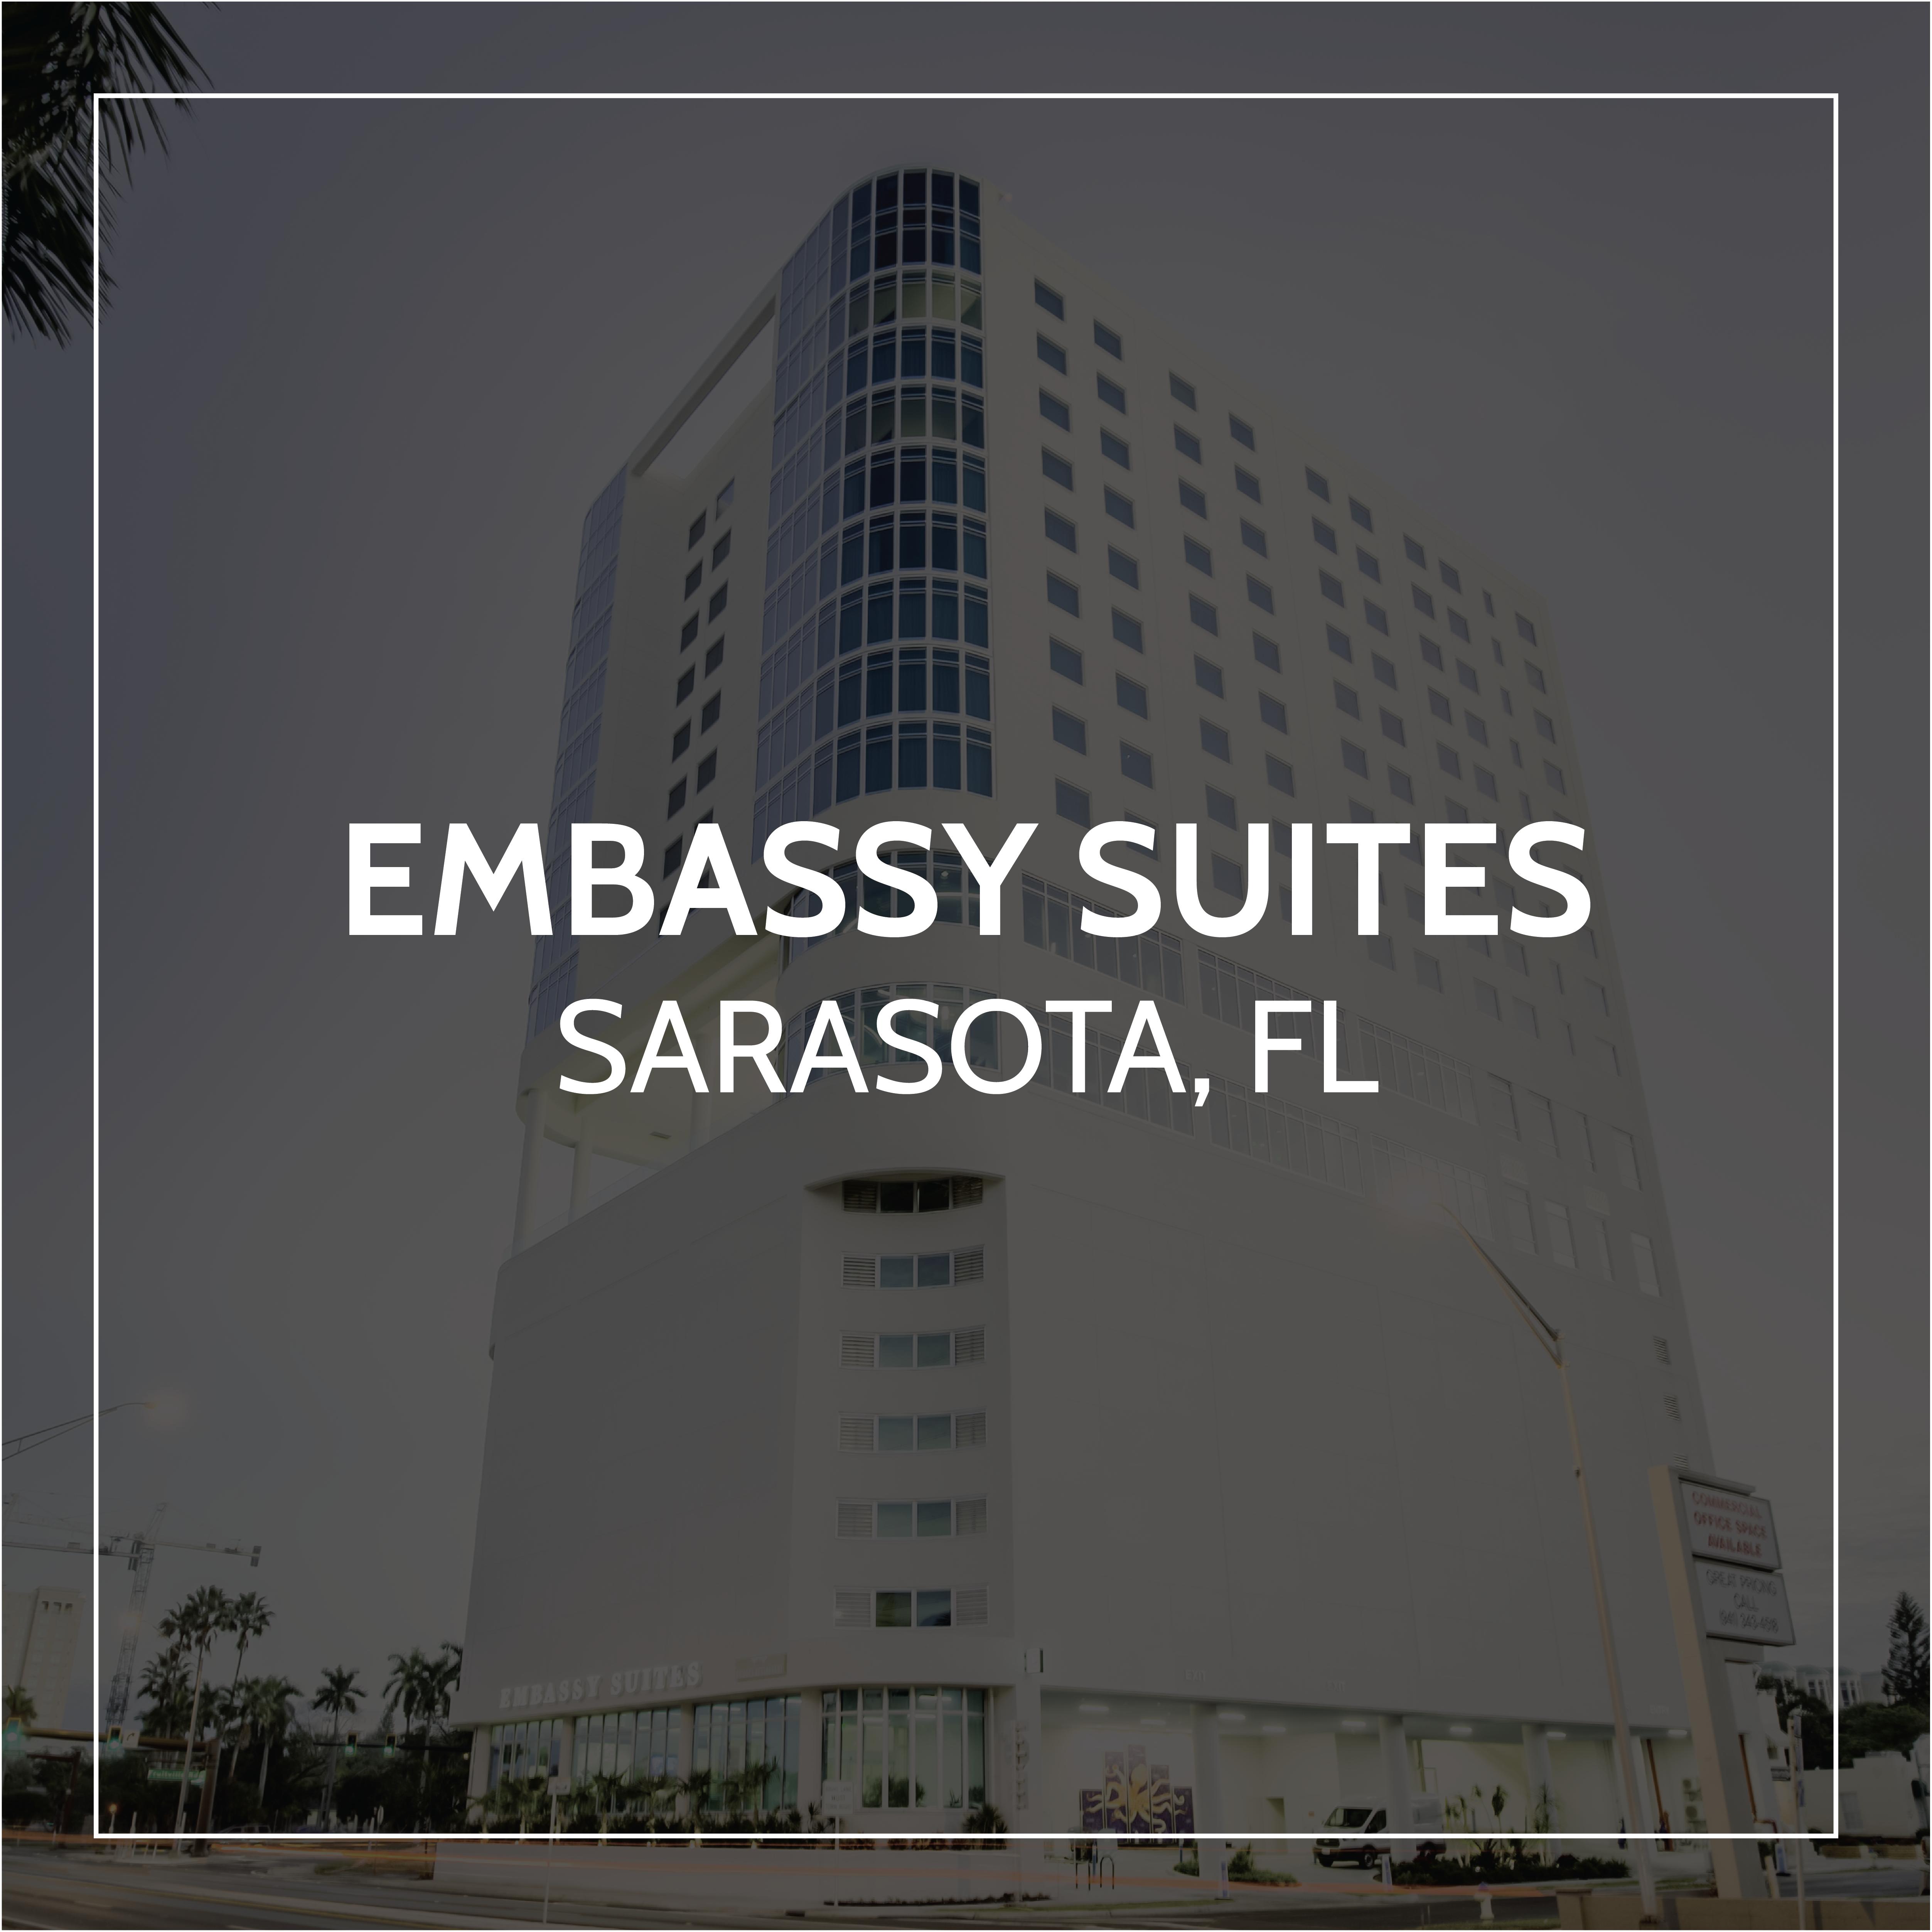 The Embassy Suites Sarasota Fl Embassy Suites Sarasota Outdoor Pool